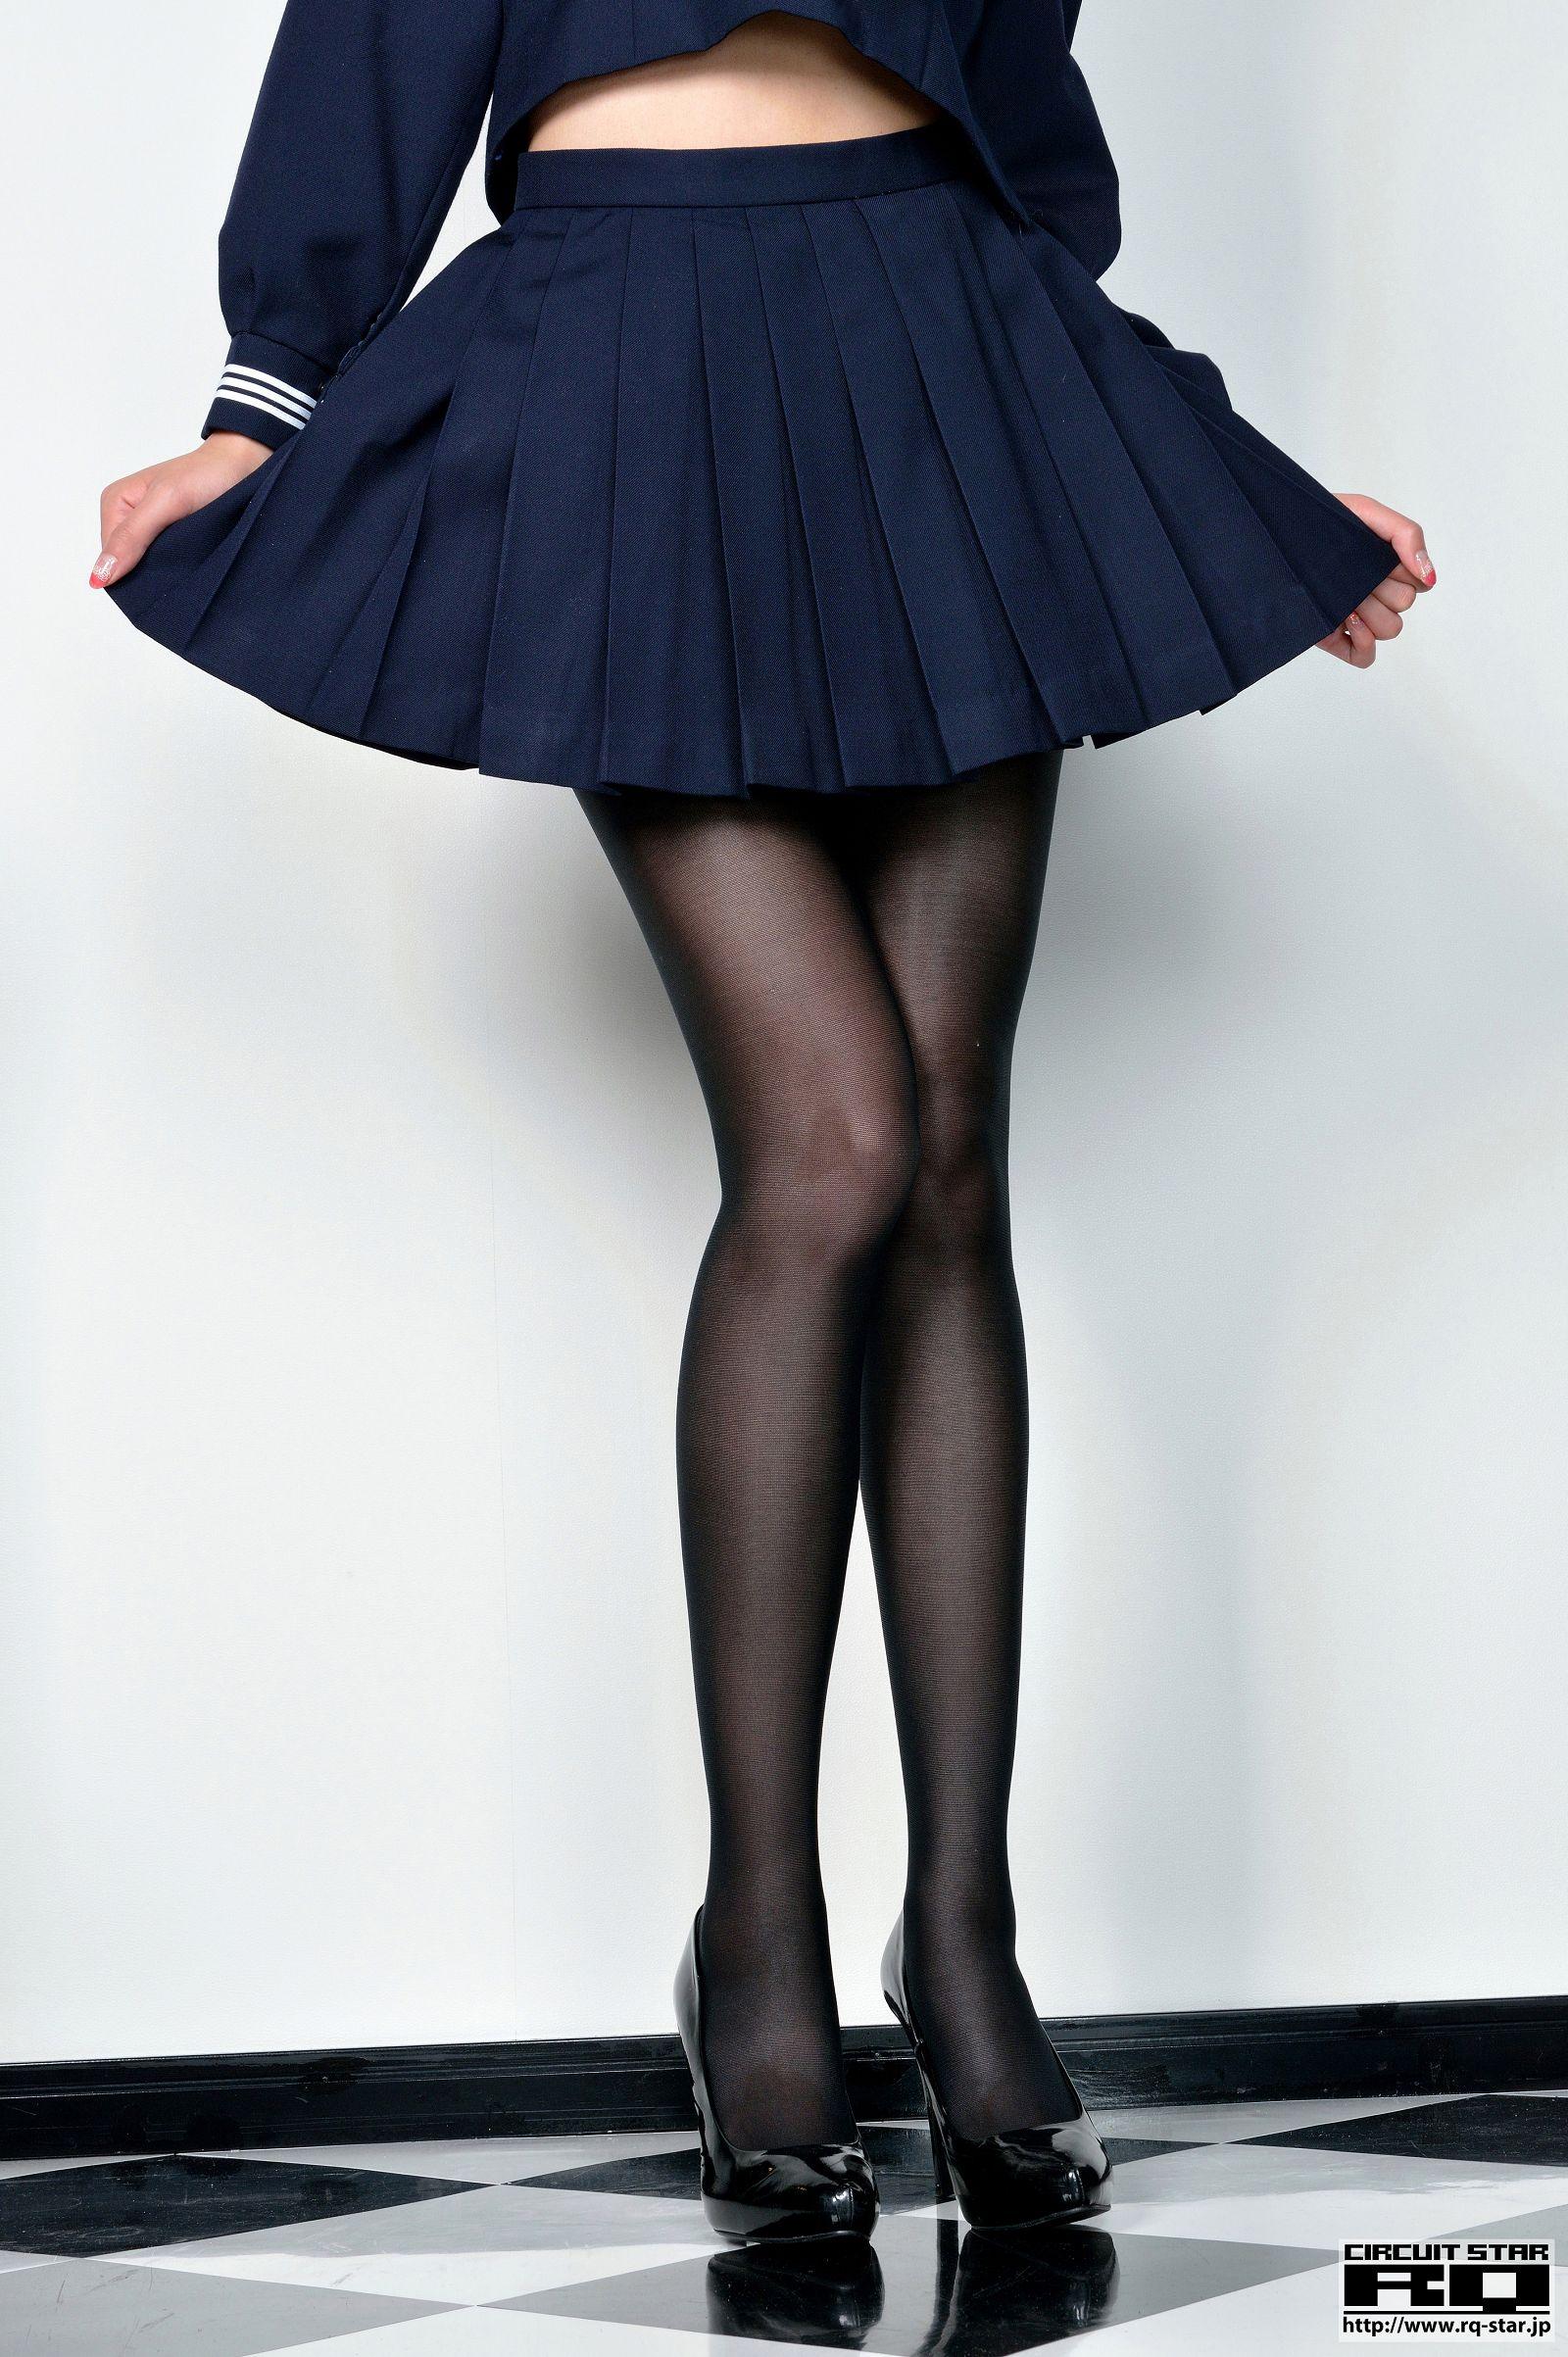 [RQ STAR美女] NO.01058 Miho Abe あべみほ School Girl[90P] RQ STAR 第4张